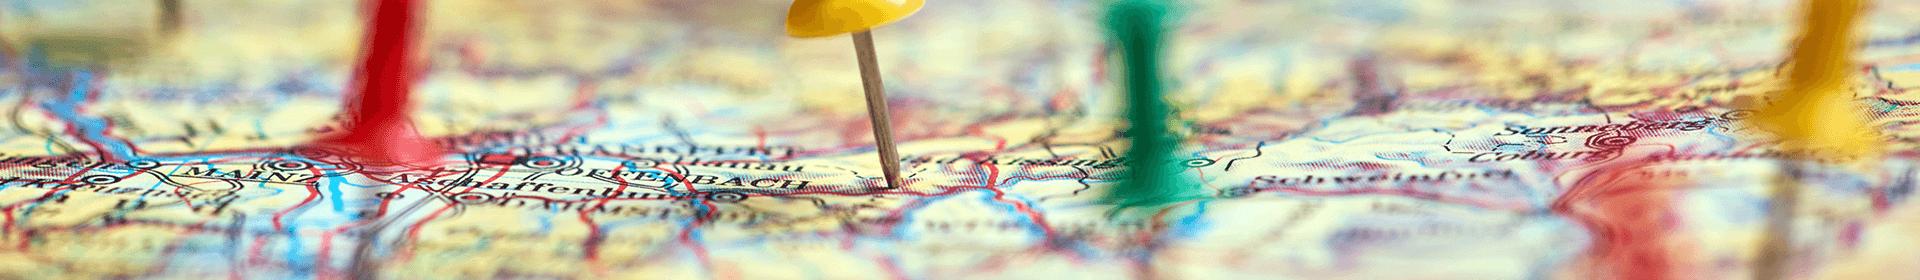 Great Destinations Worldwide - Kenya Airways on kenya location on world map, republic airways holdings route map, british airways route map, bangkok airways route map, sudan airways route map, xtra airways route map, jet airways route map, zimbabwe airways route map, us airways route map, kenya airways home, etihad airways route map, qatar airways route map, kenya airways fares, thai airways route map, silver airways route map, kenya airways 747 interior, south african airways route map, xl airways route map, pan american world airways route map,